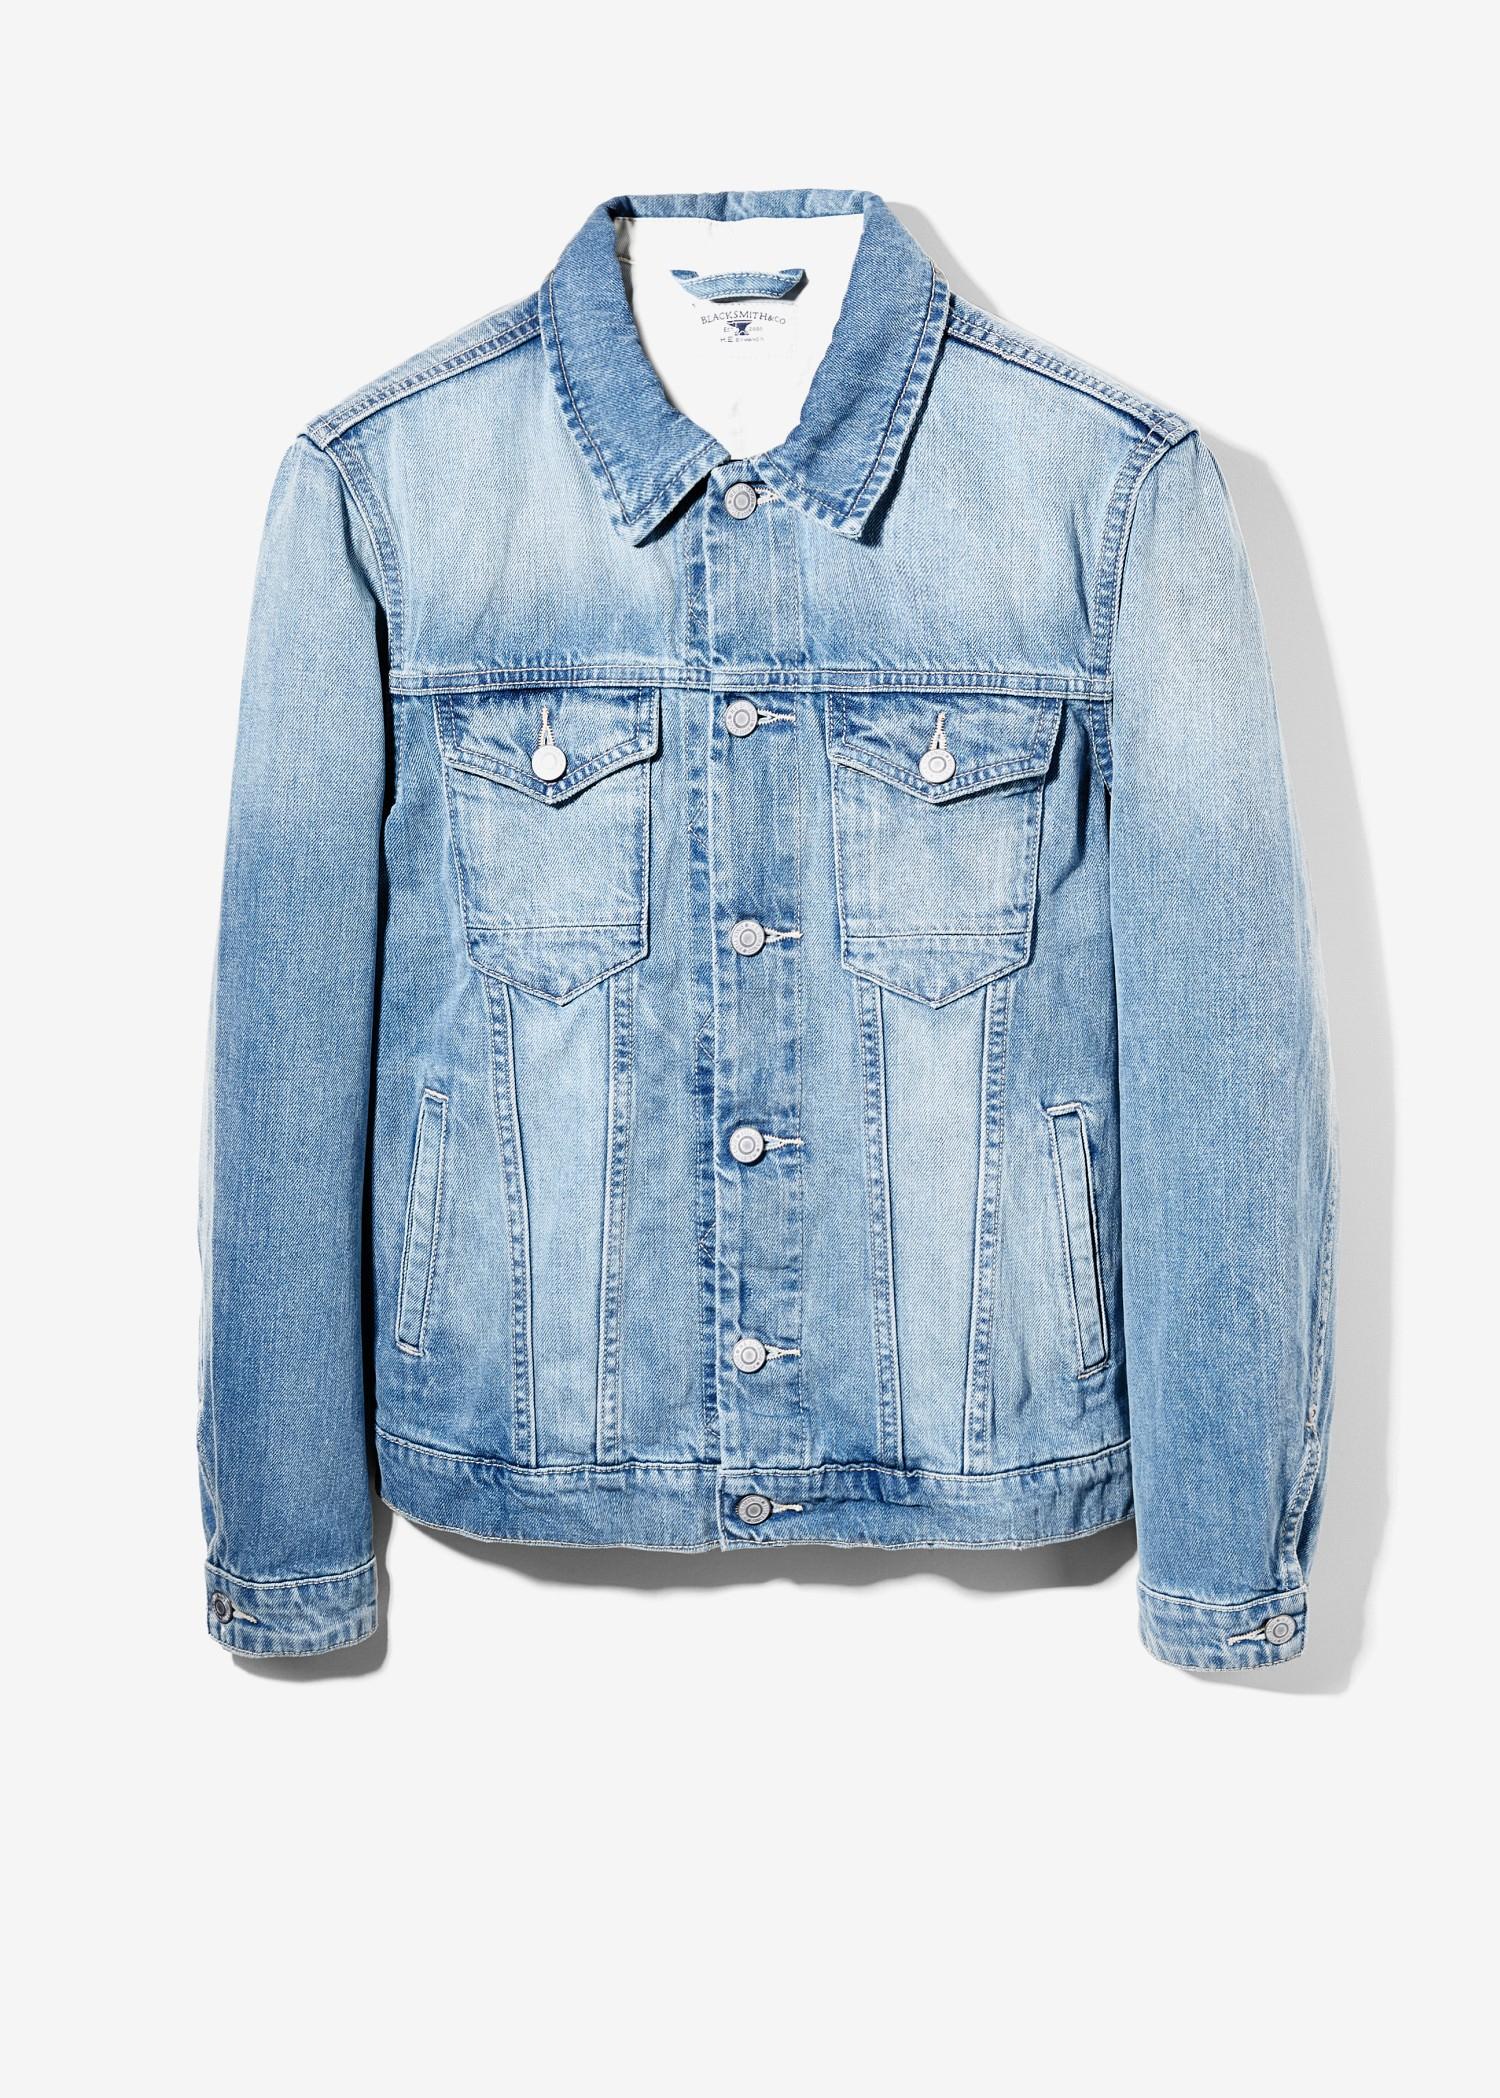 Mango Light Wash Denim Jacket In Blue For Men Lyst